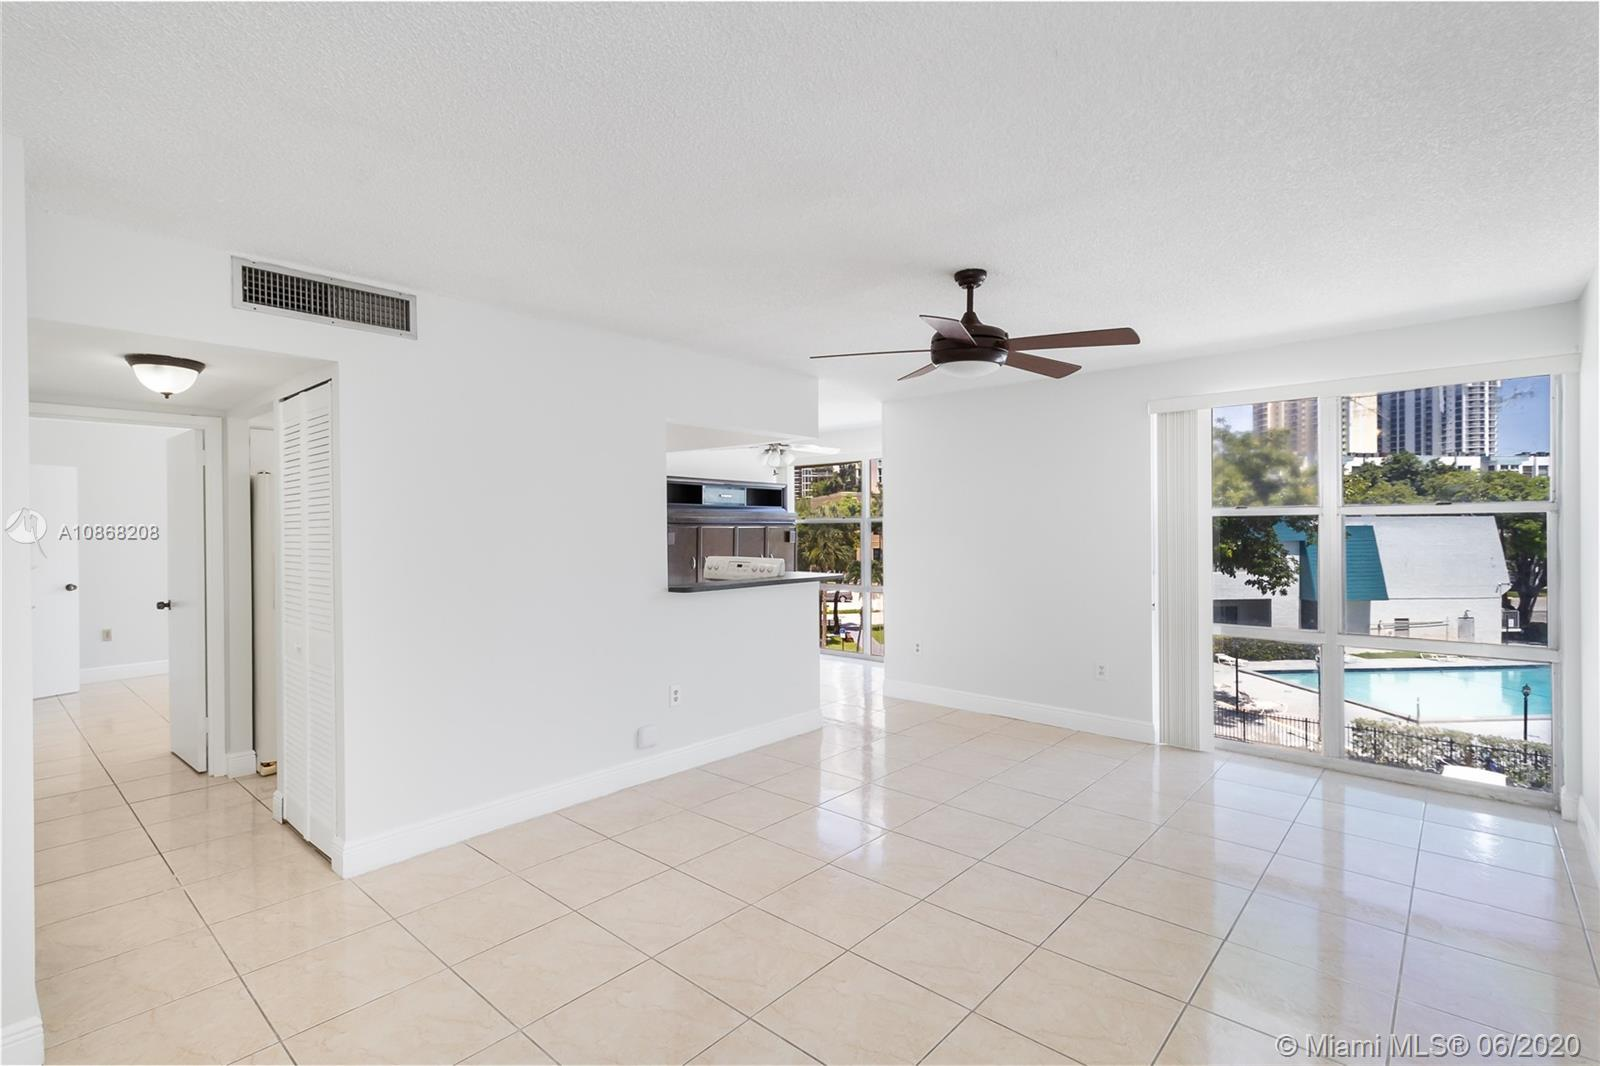 200 177th Dr 314, Sunny Isles Beach, FL 33160